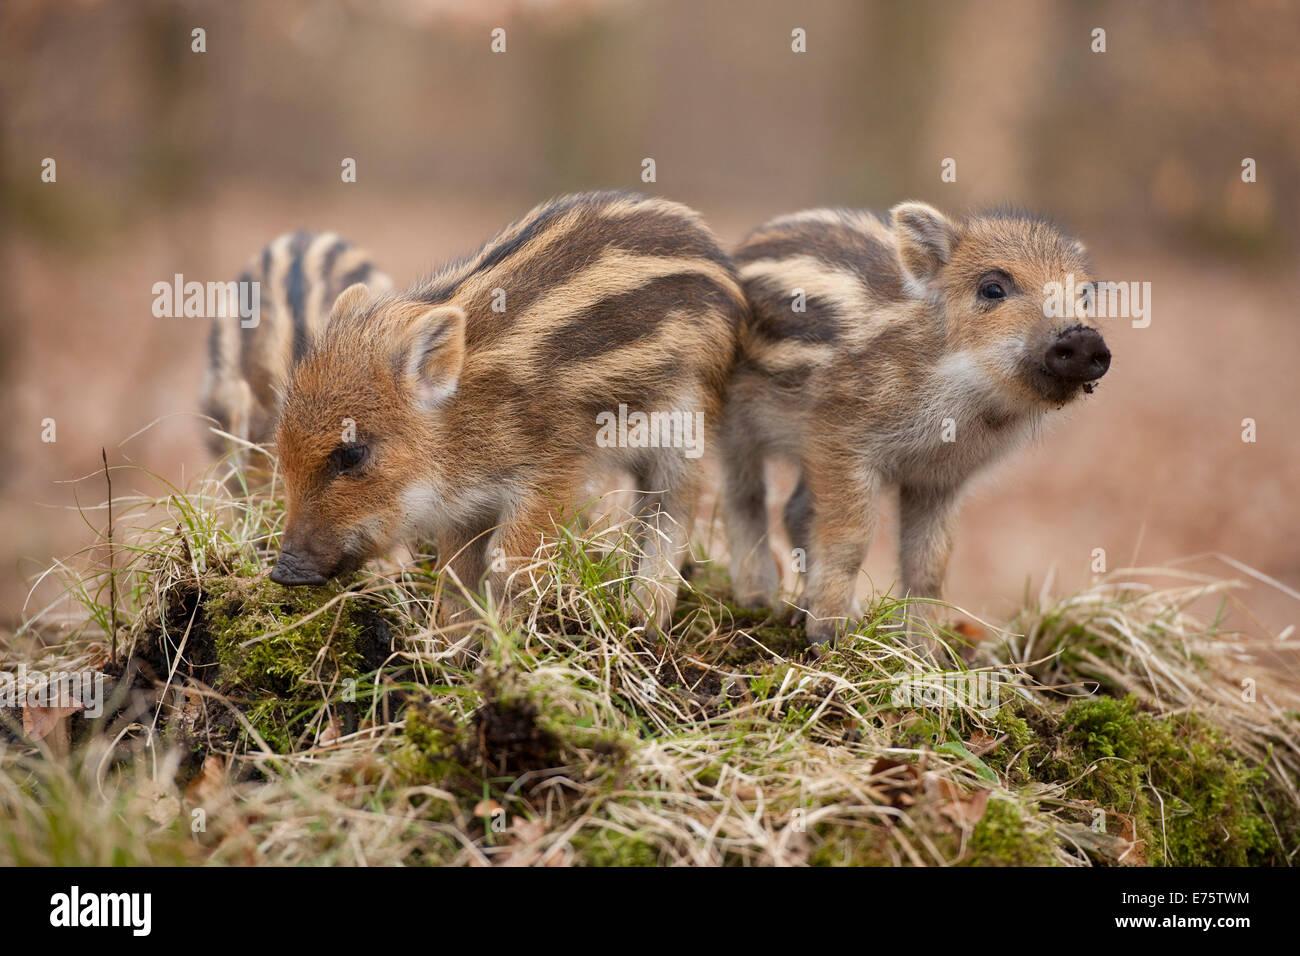 Wild Boars (Sus scrofa), piglets, captive, North Rhine-Westphalia, Germany - Stock Image